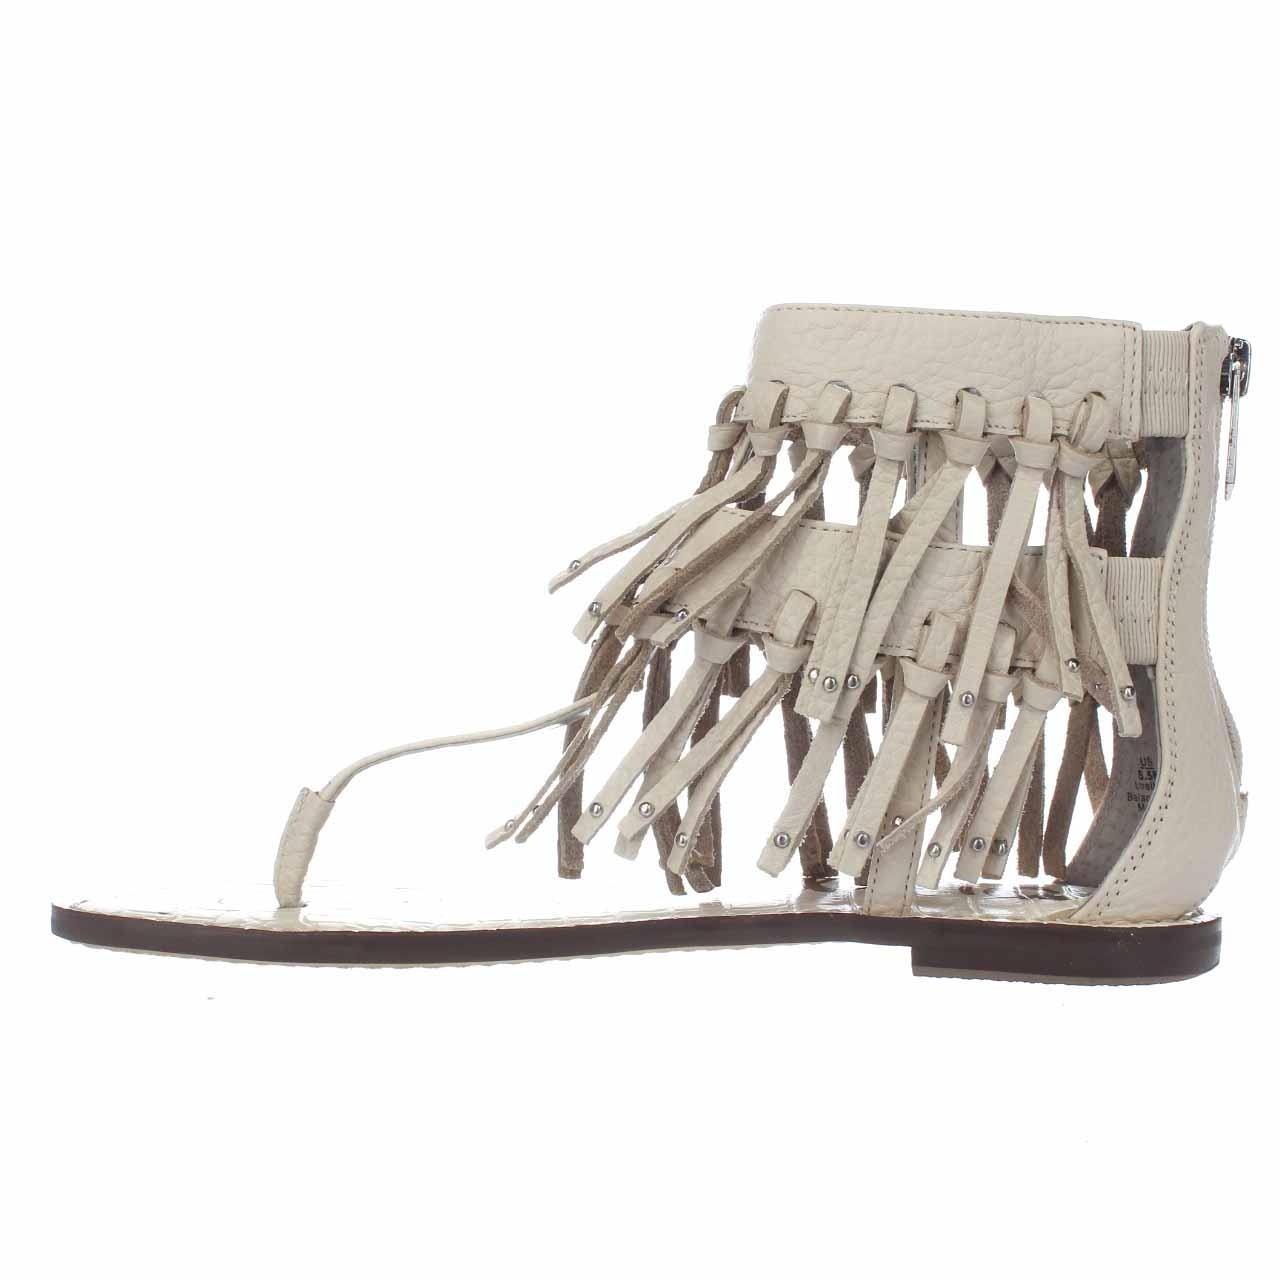 3d1788eb42c554 Shop Sam Edelman Griffen Gladiator Fringe Sandals